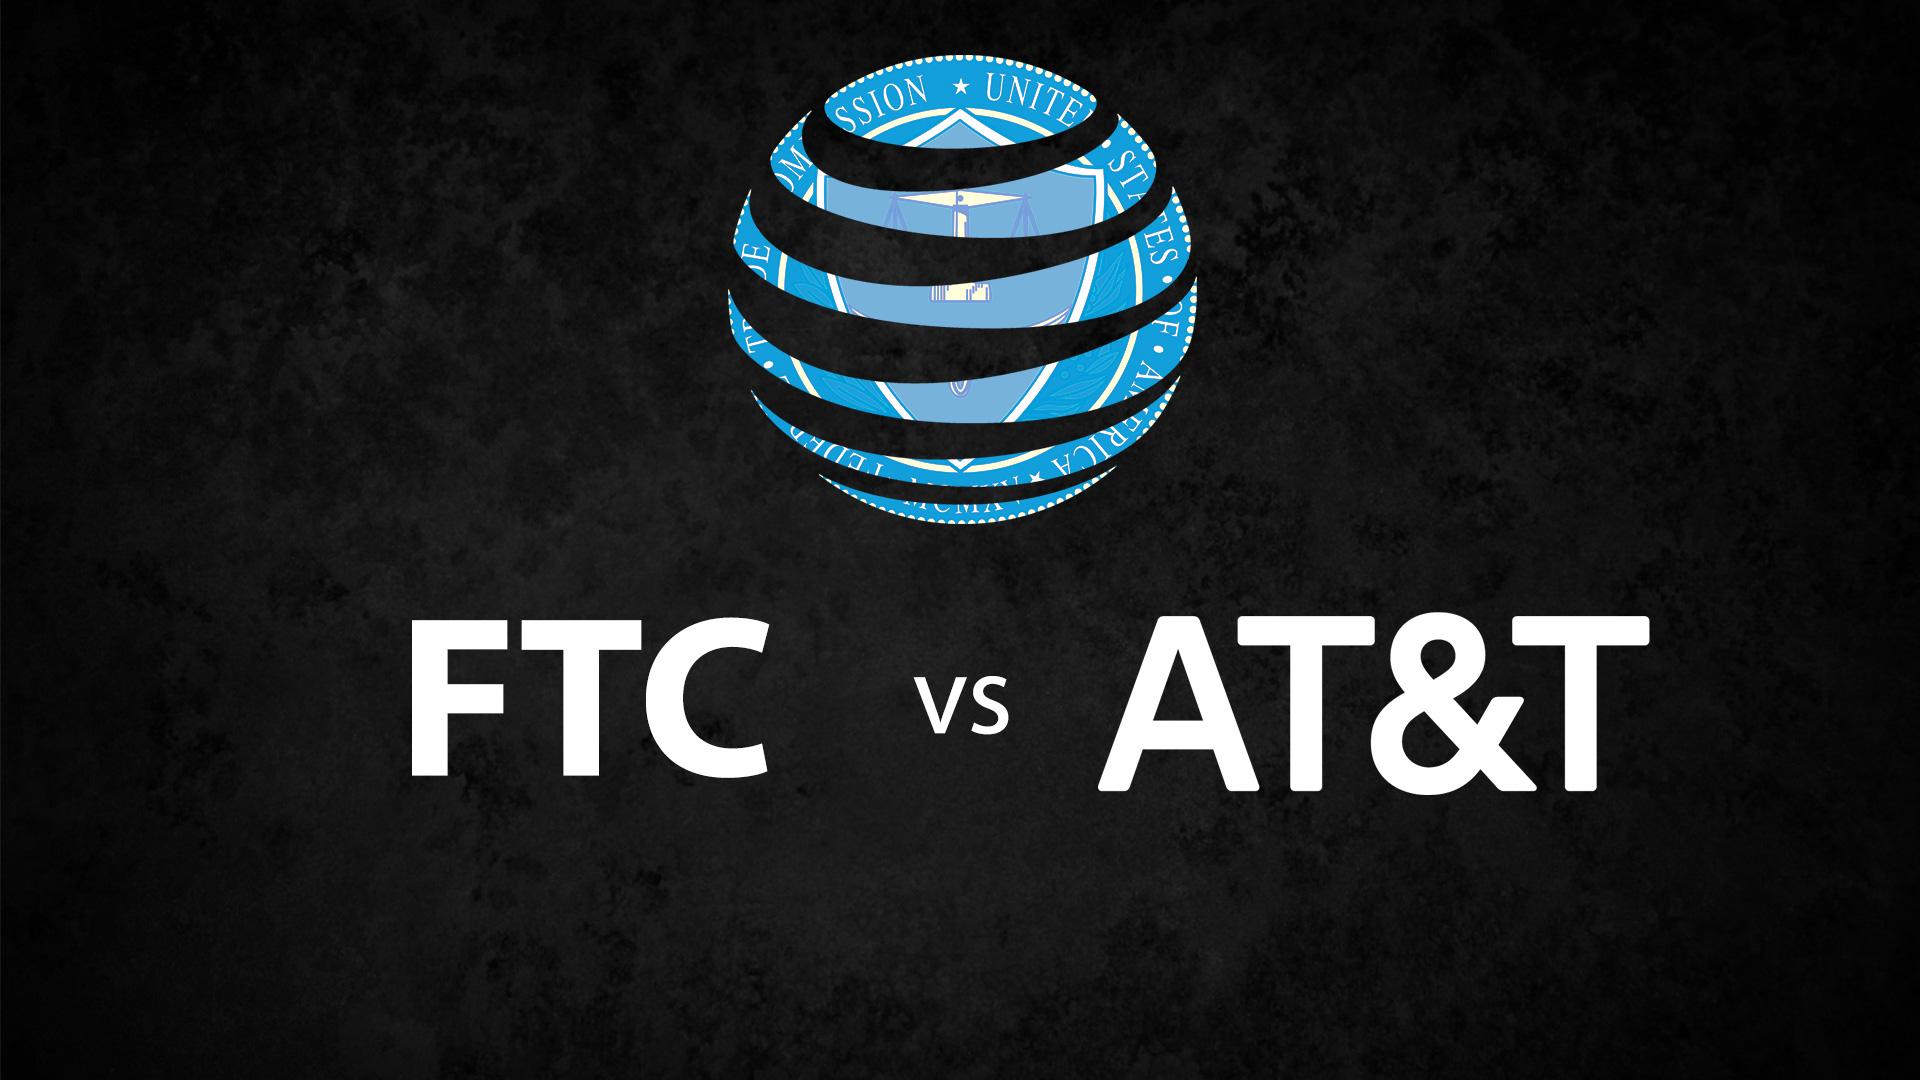 Net Neutrality: FTC vs. AT&T